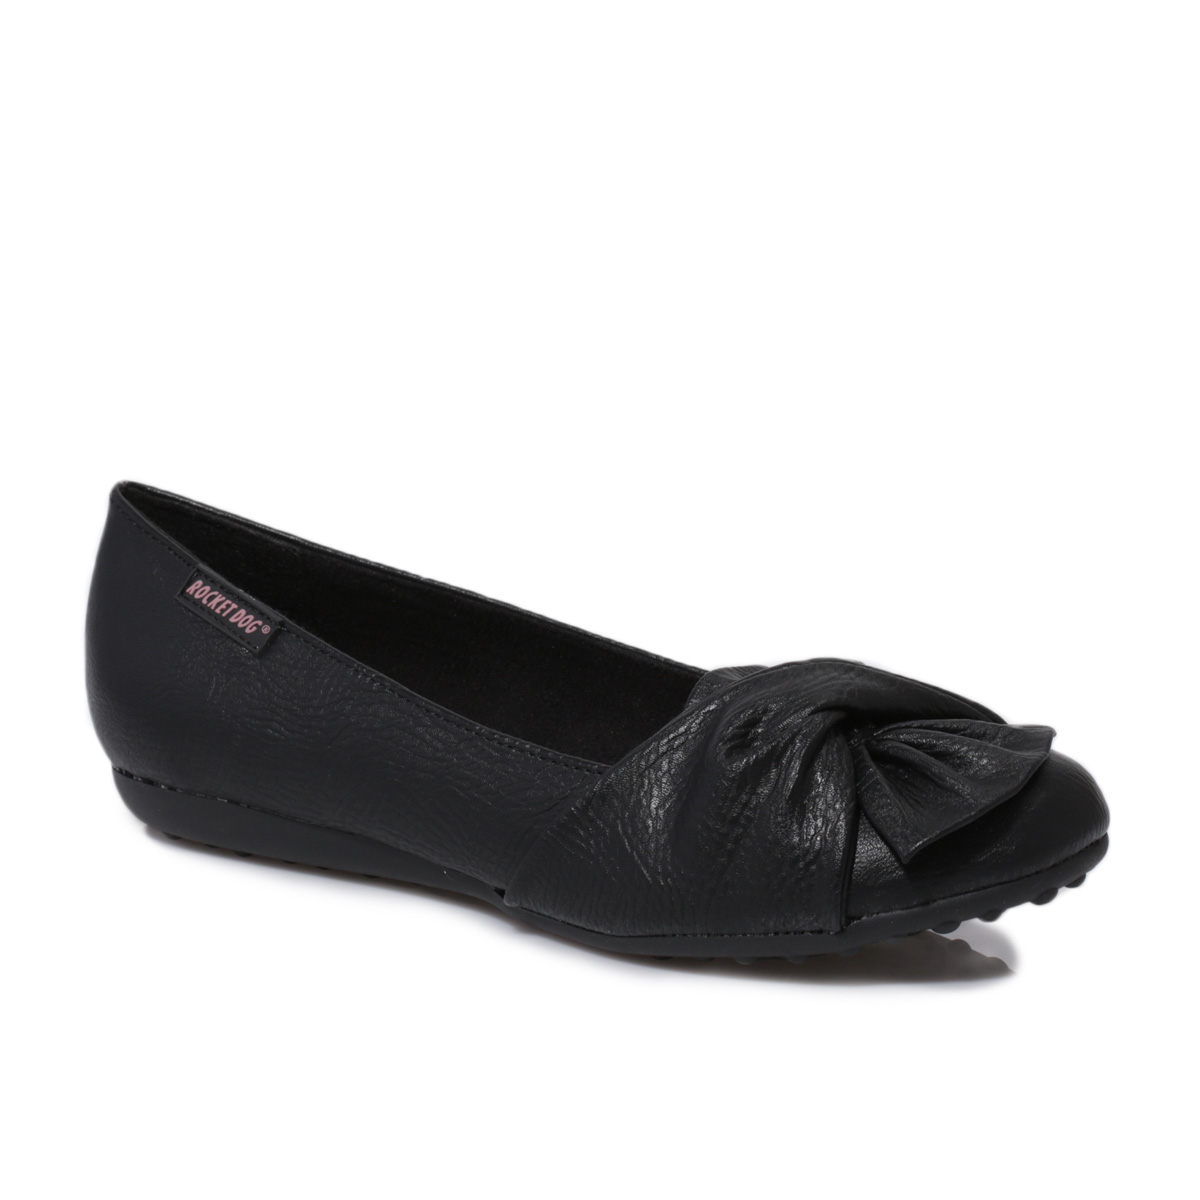 Rocket Dog Shoes Womens Flats